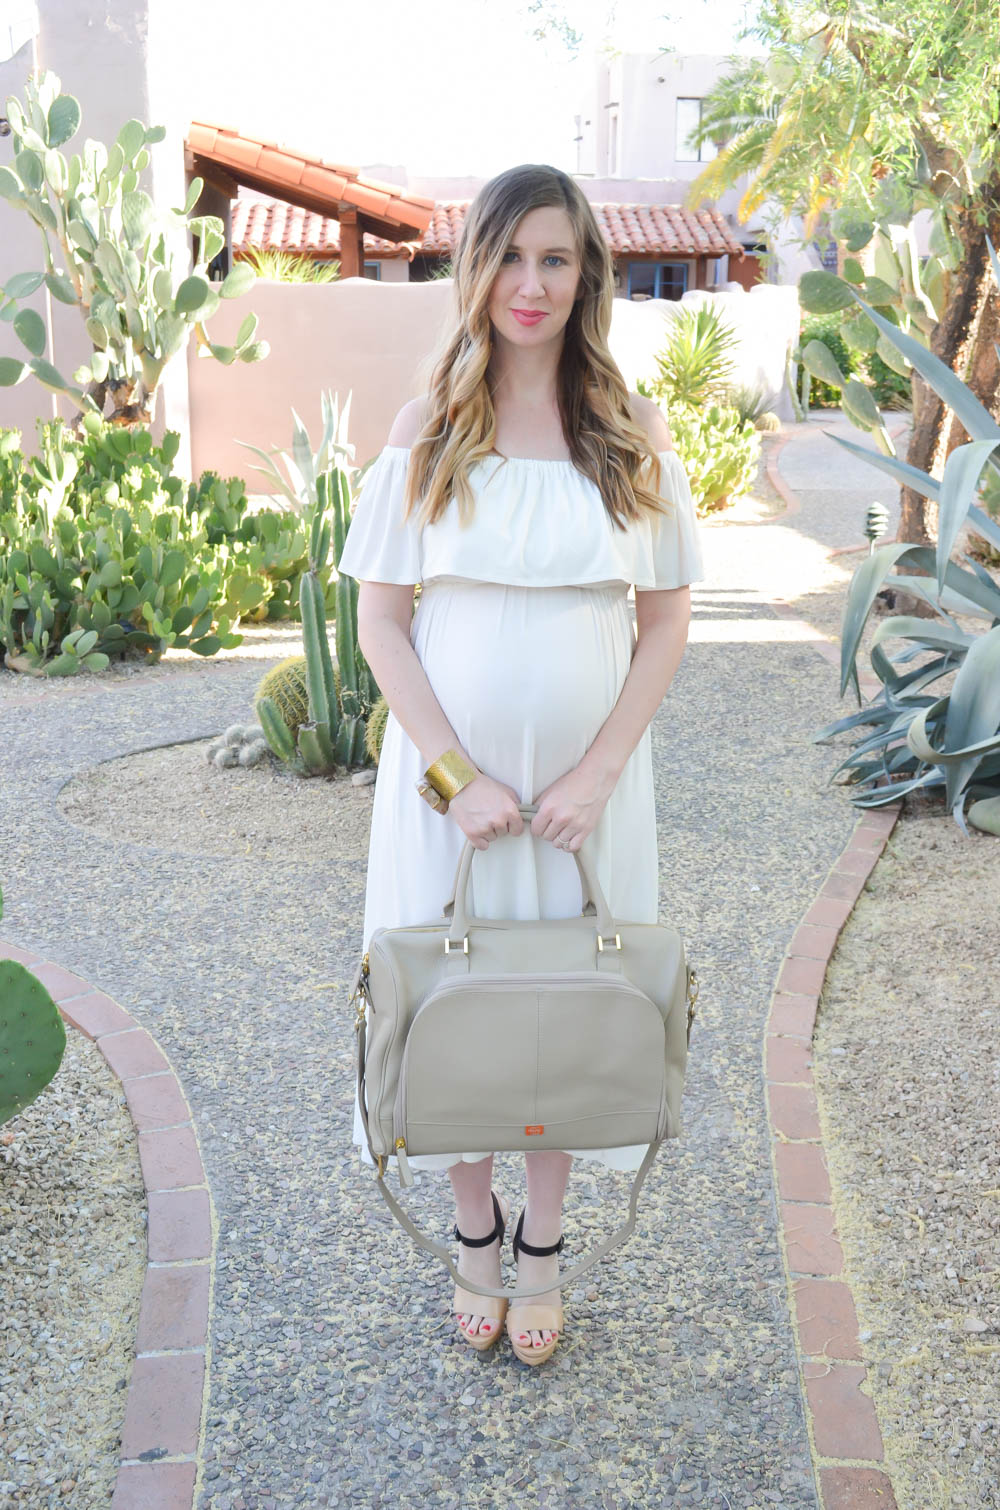 Maternity Dress | Nursing Dress | PacaPod diaper Bag | Maternity Fashion | Maternity Clothes